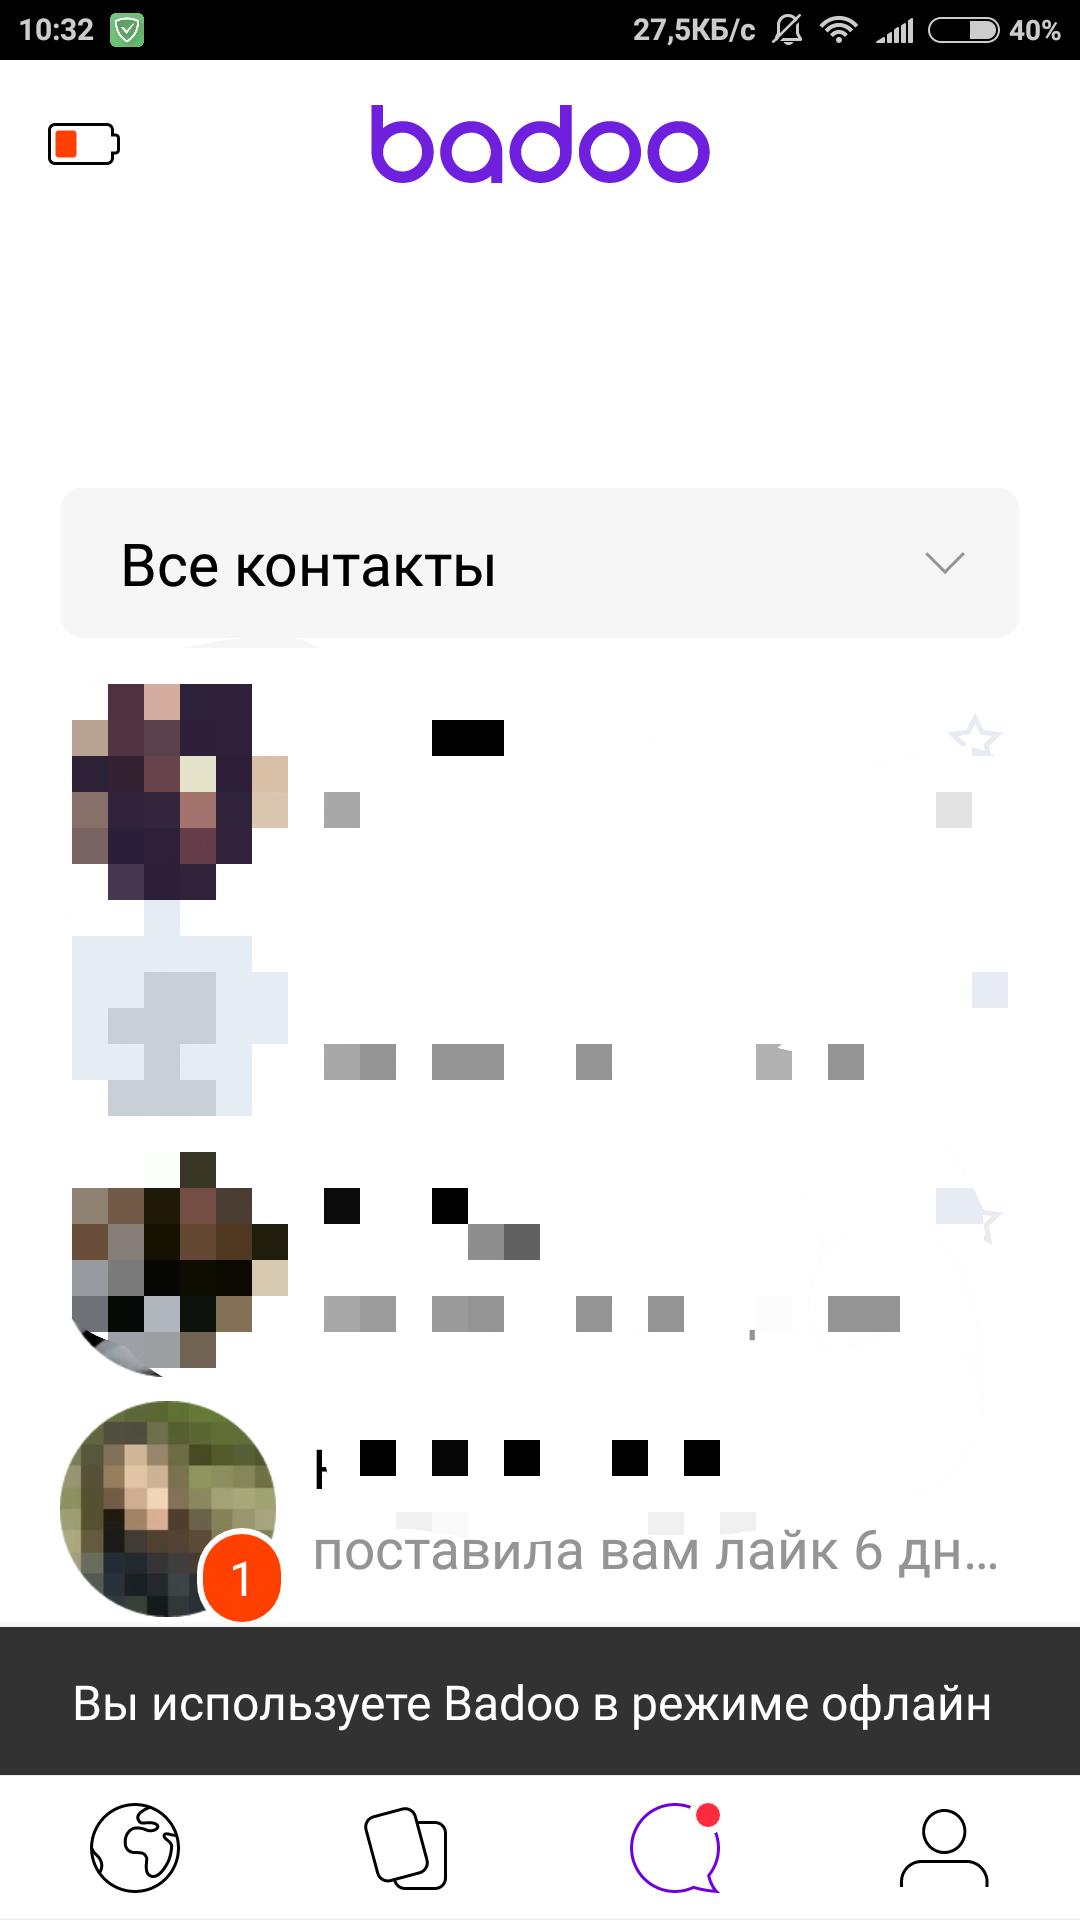 Screenshot_2018-01-23-10-32-38-570_com.badoo.mobile.png